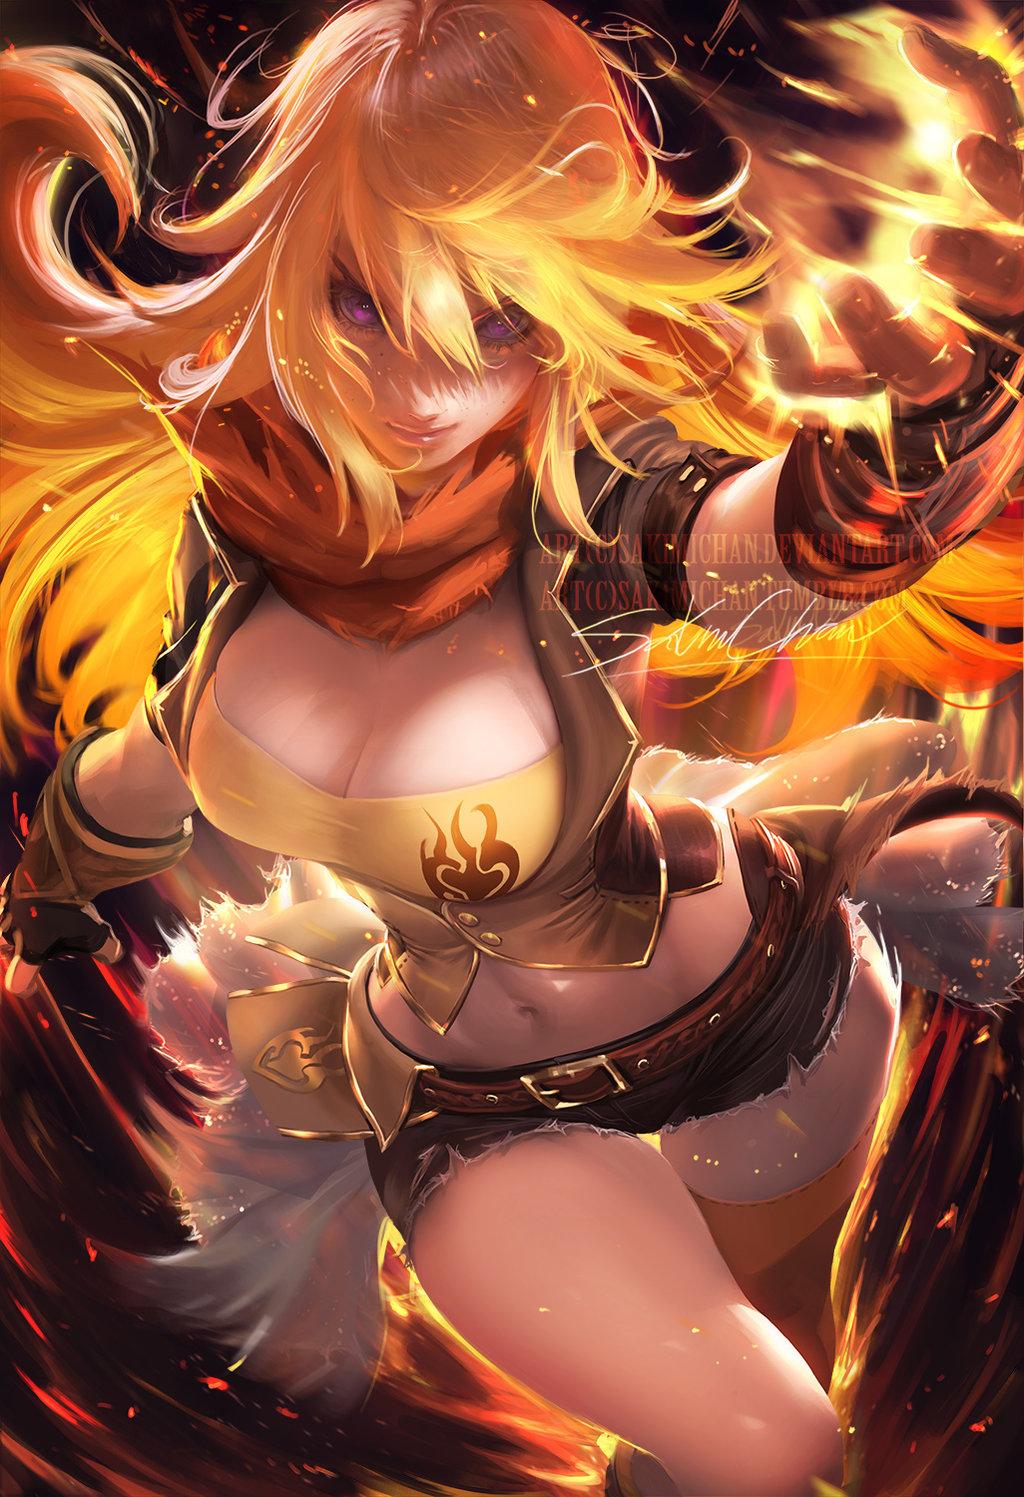 Anime Woman Warrior Cg Artwork Fictional Character Mythology Computer Wallpaper